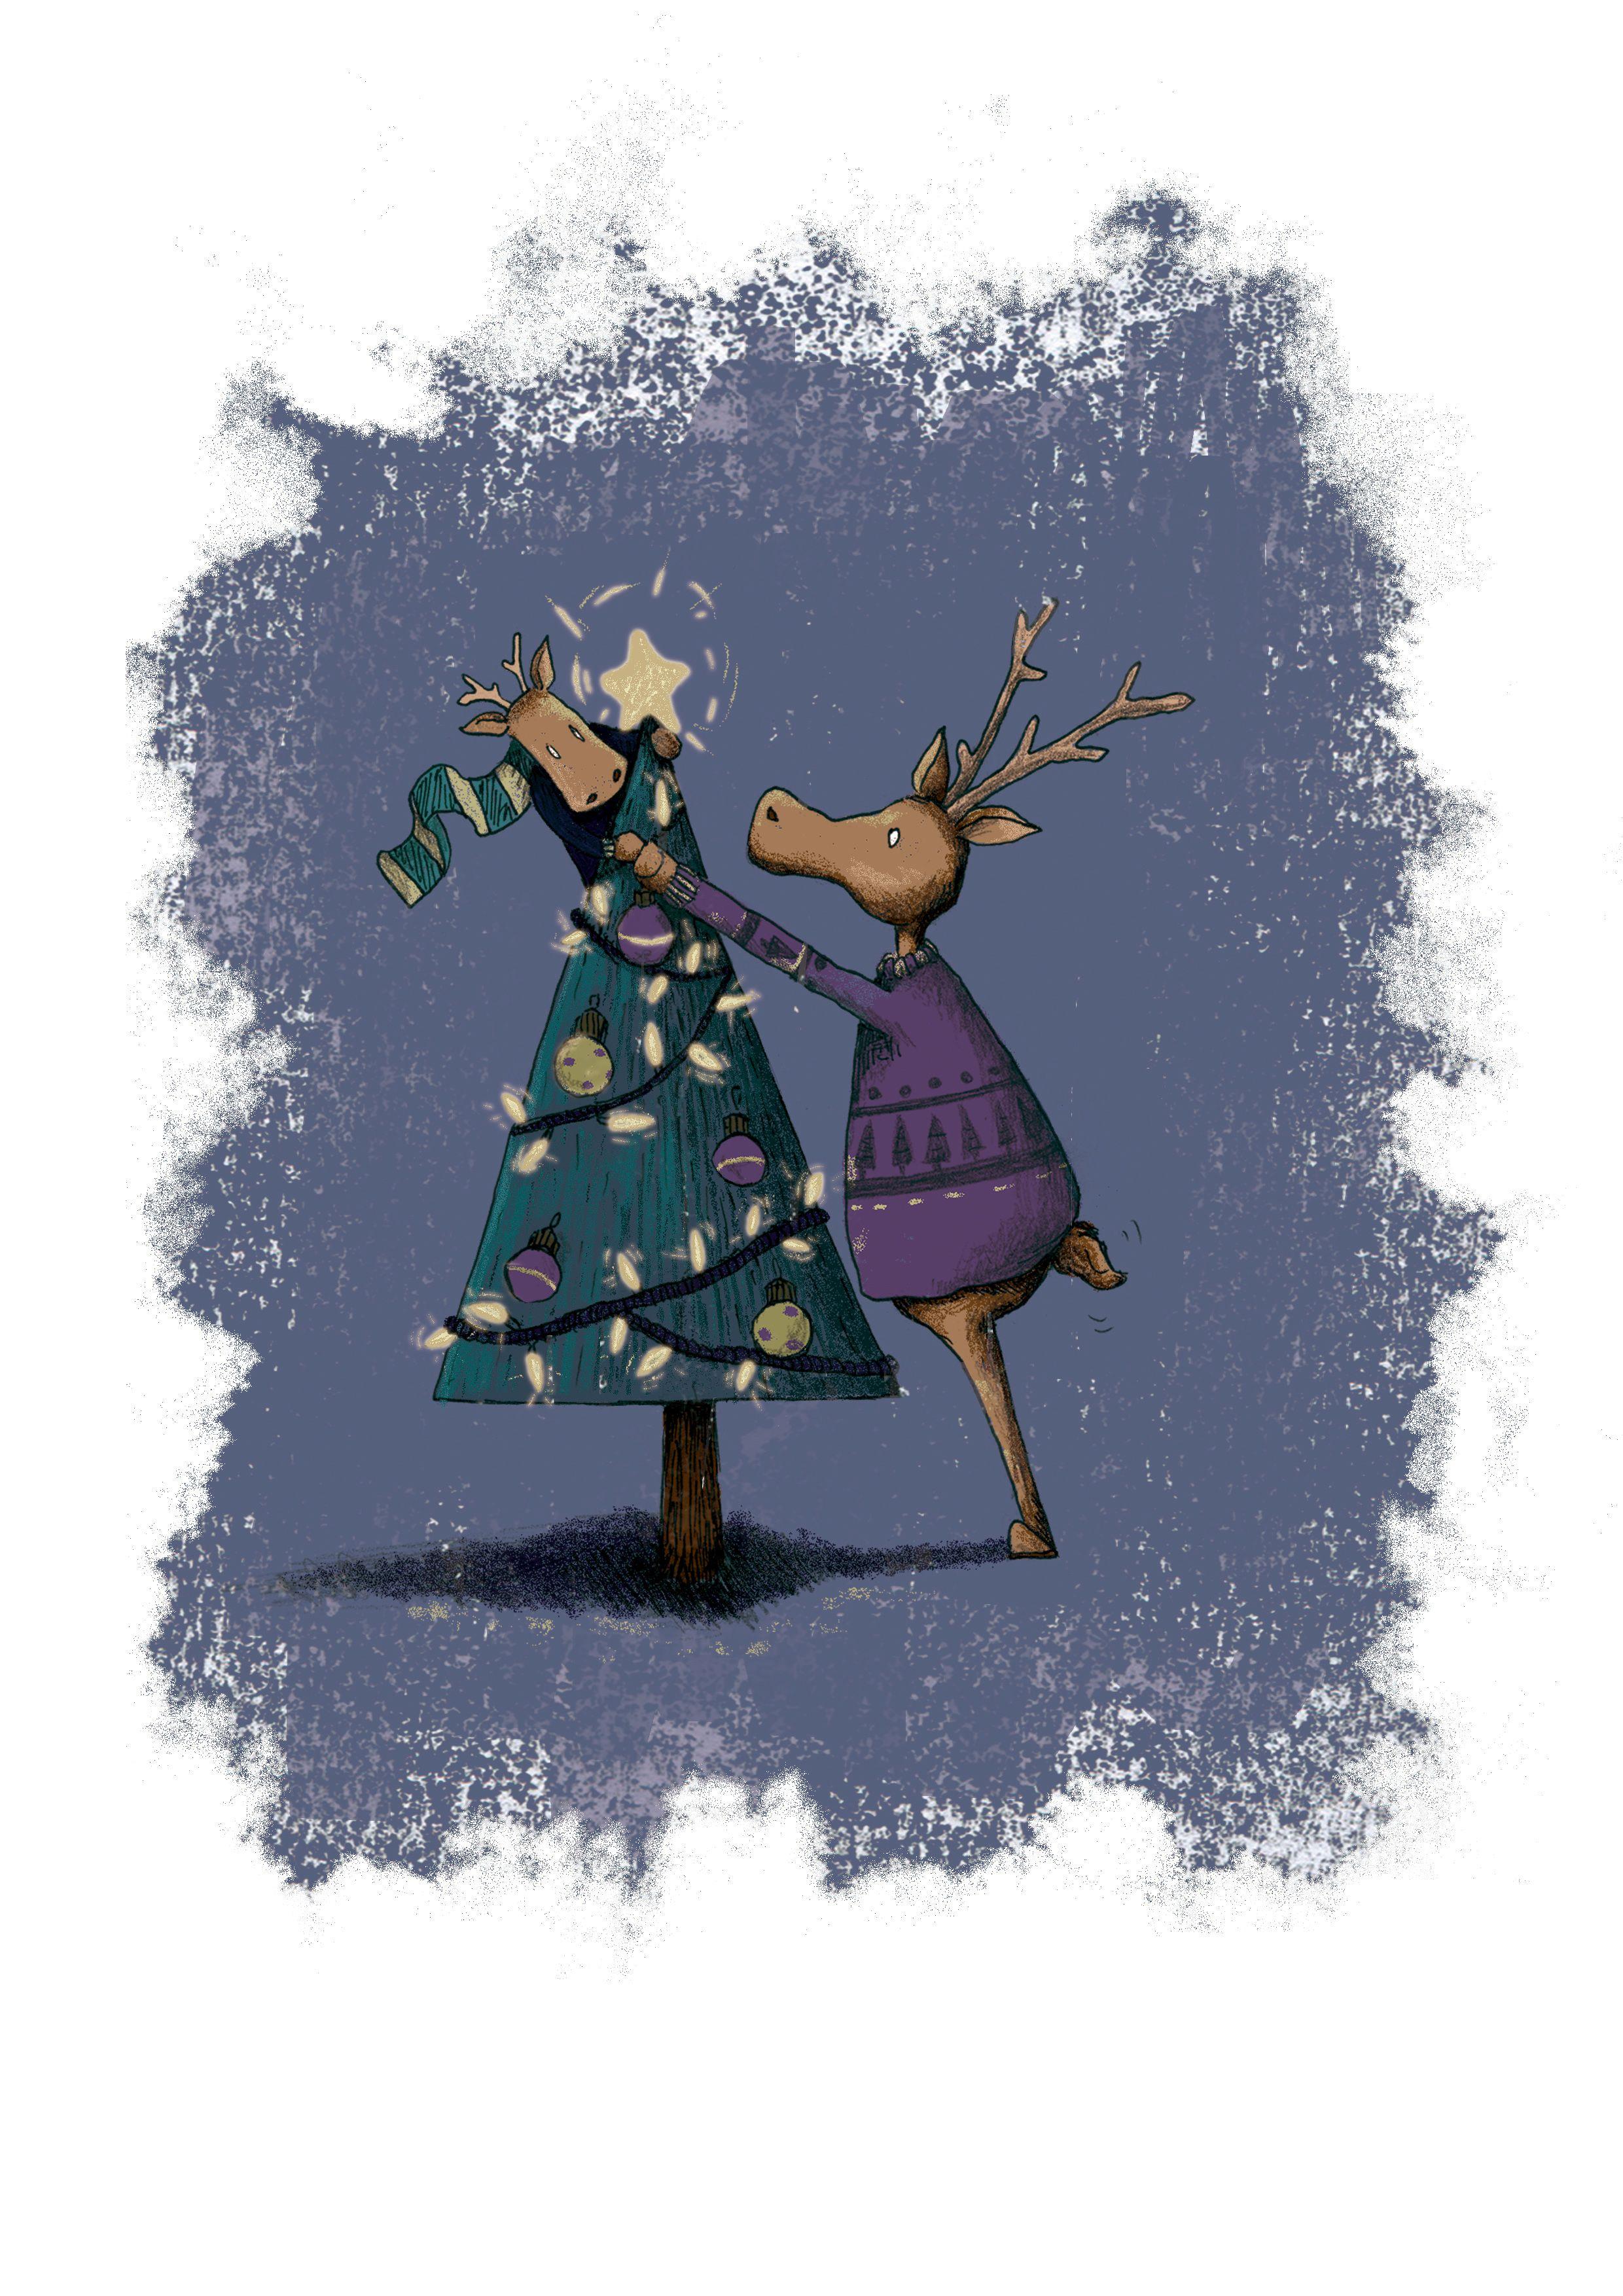 11 Irish Illustrators You Should Support This Christmas Season